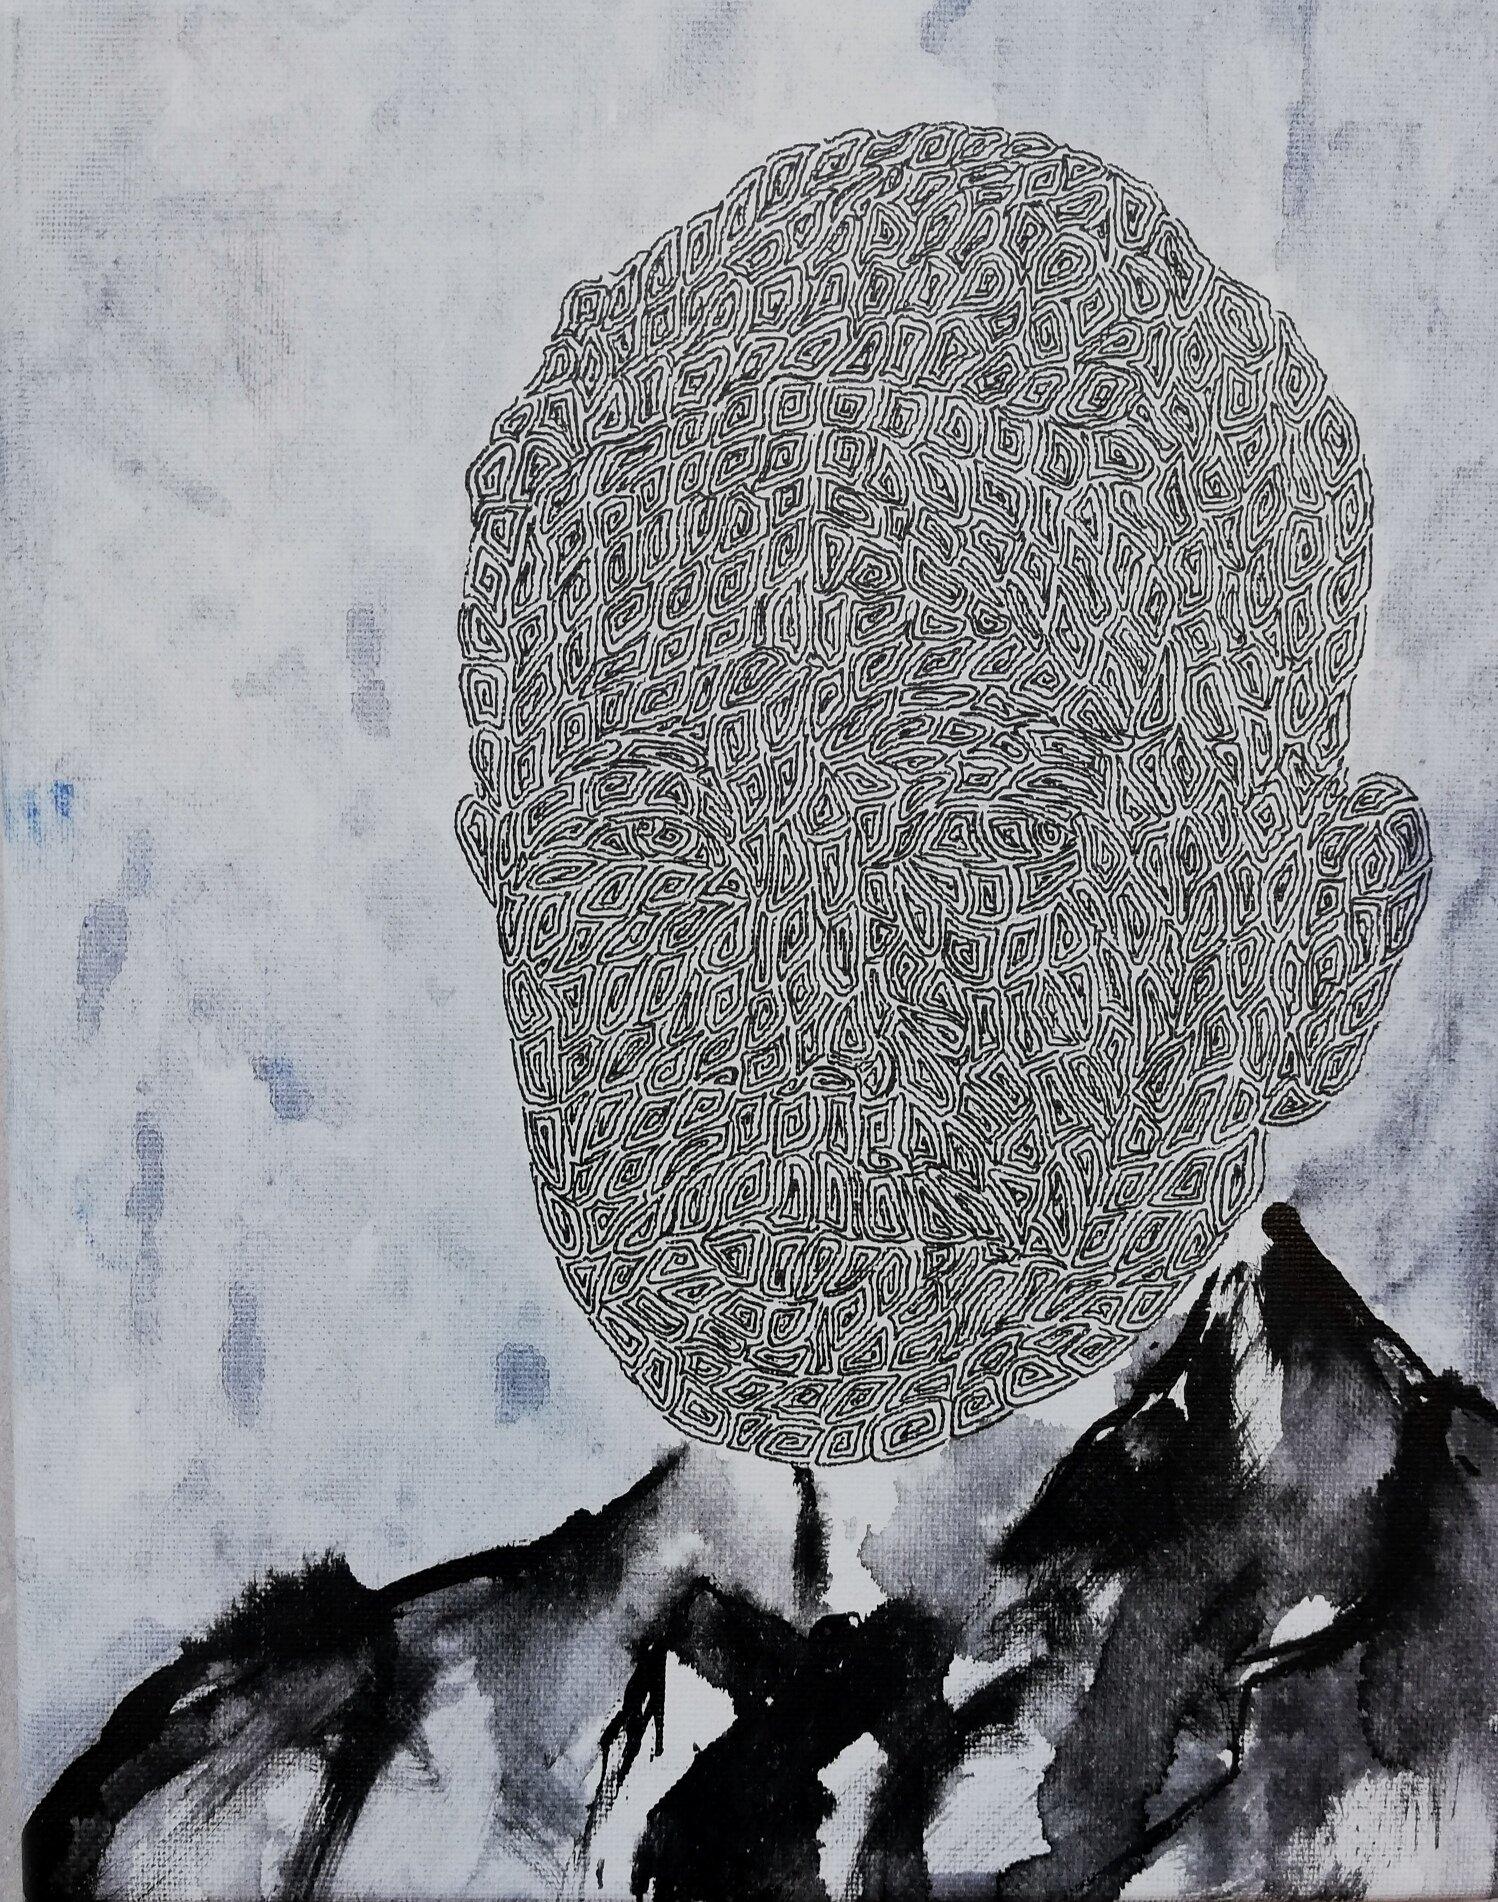 SANF057 Naoki Fuku_No Longer Human(Natsume)_Ink, acrylic, watercolor and brush pen on canvas_18x24cm_2019.jpg